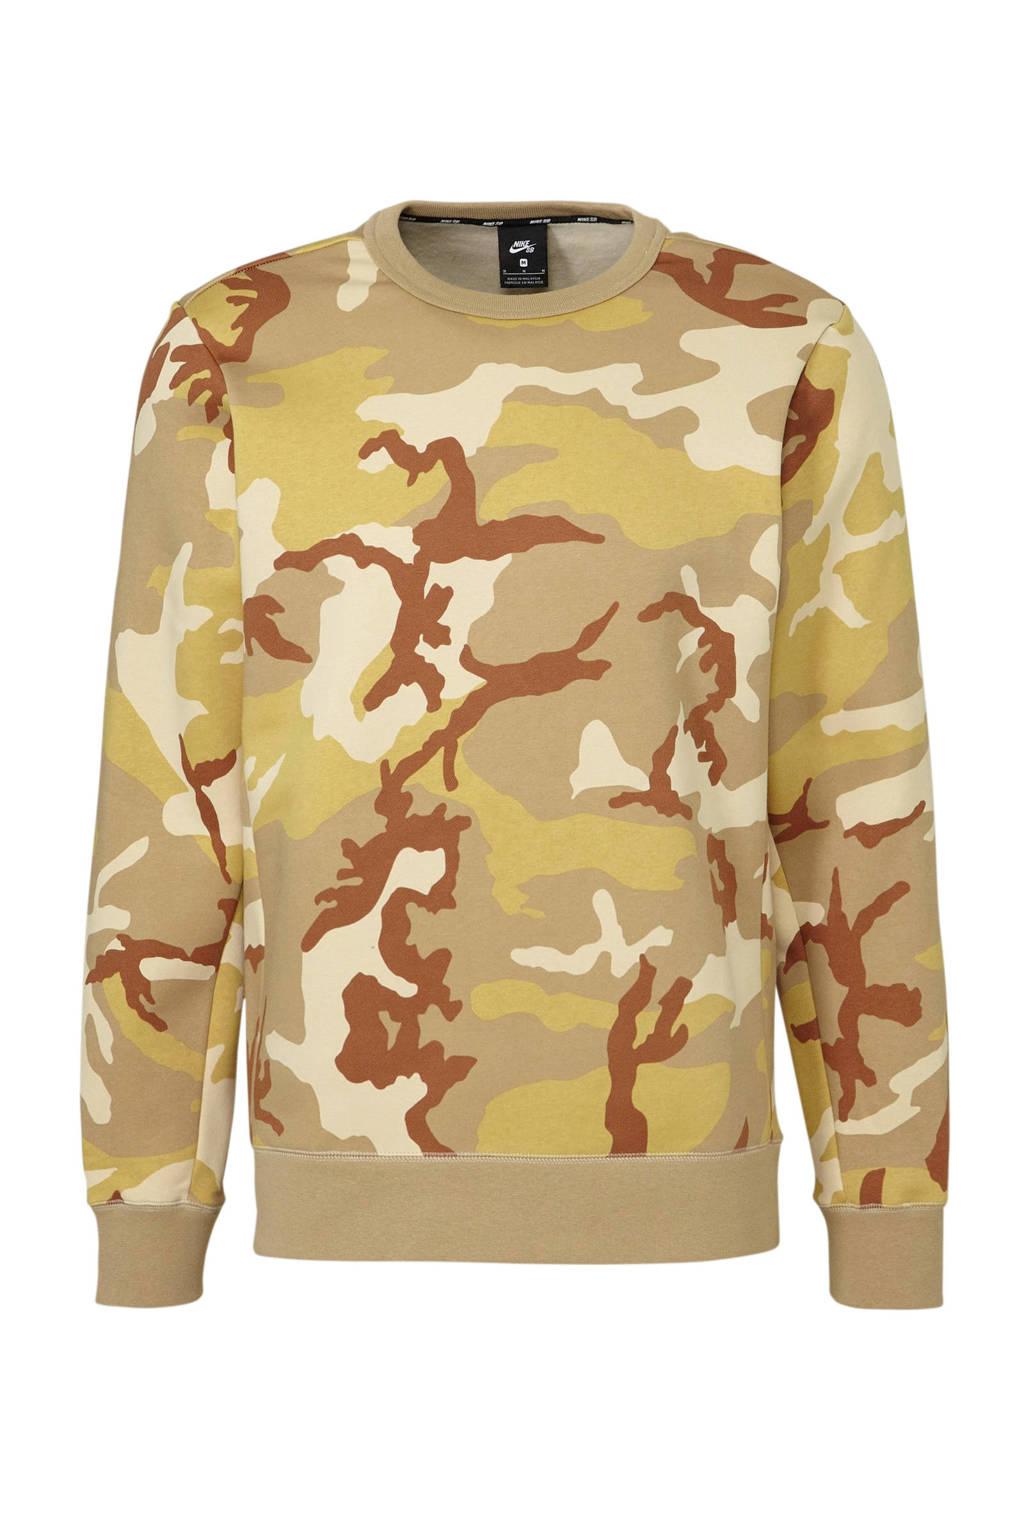 Nike   sweater camouflage, camel/groen